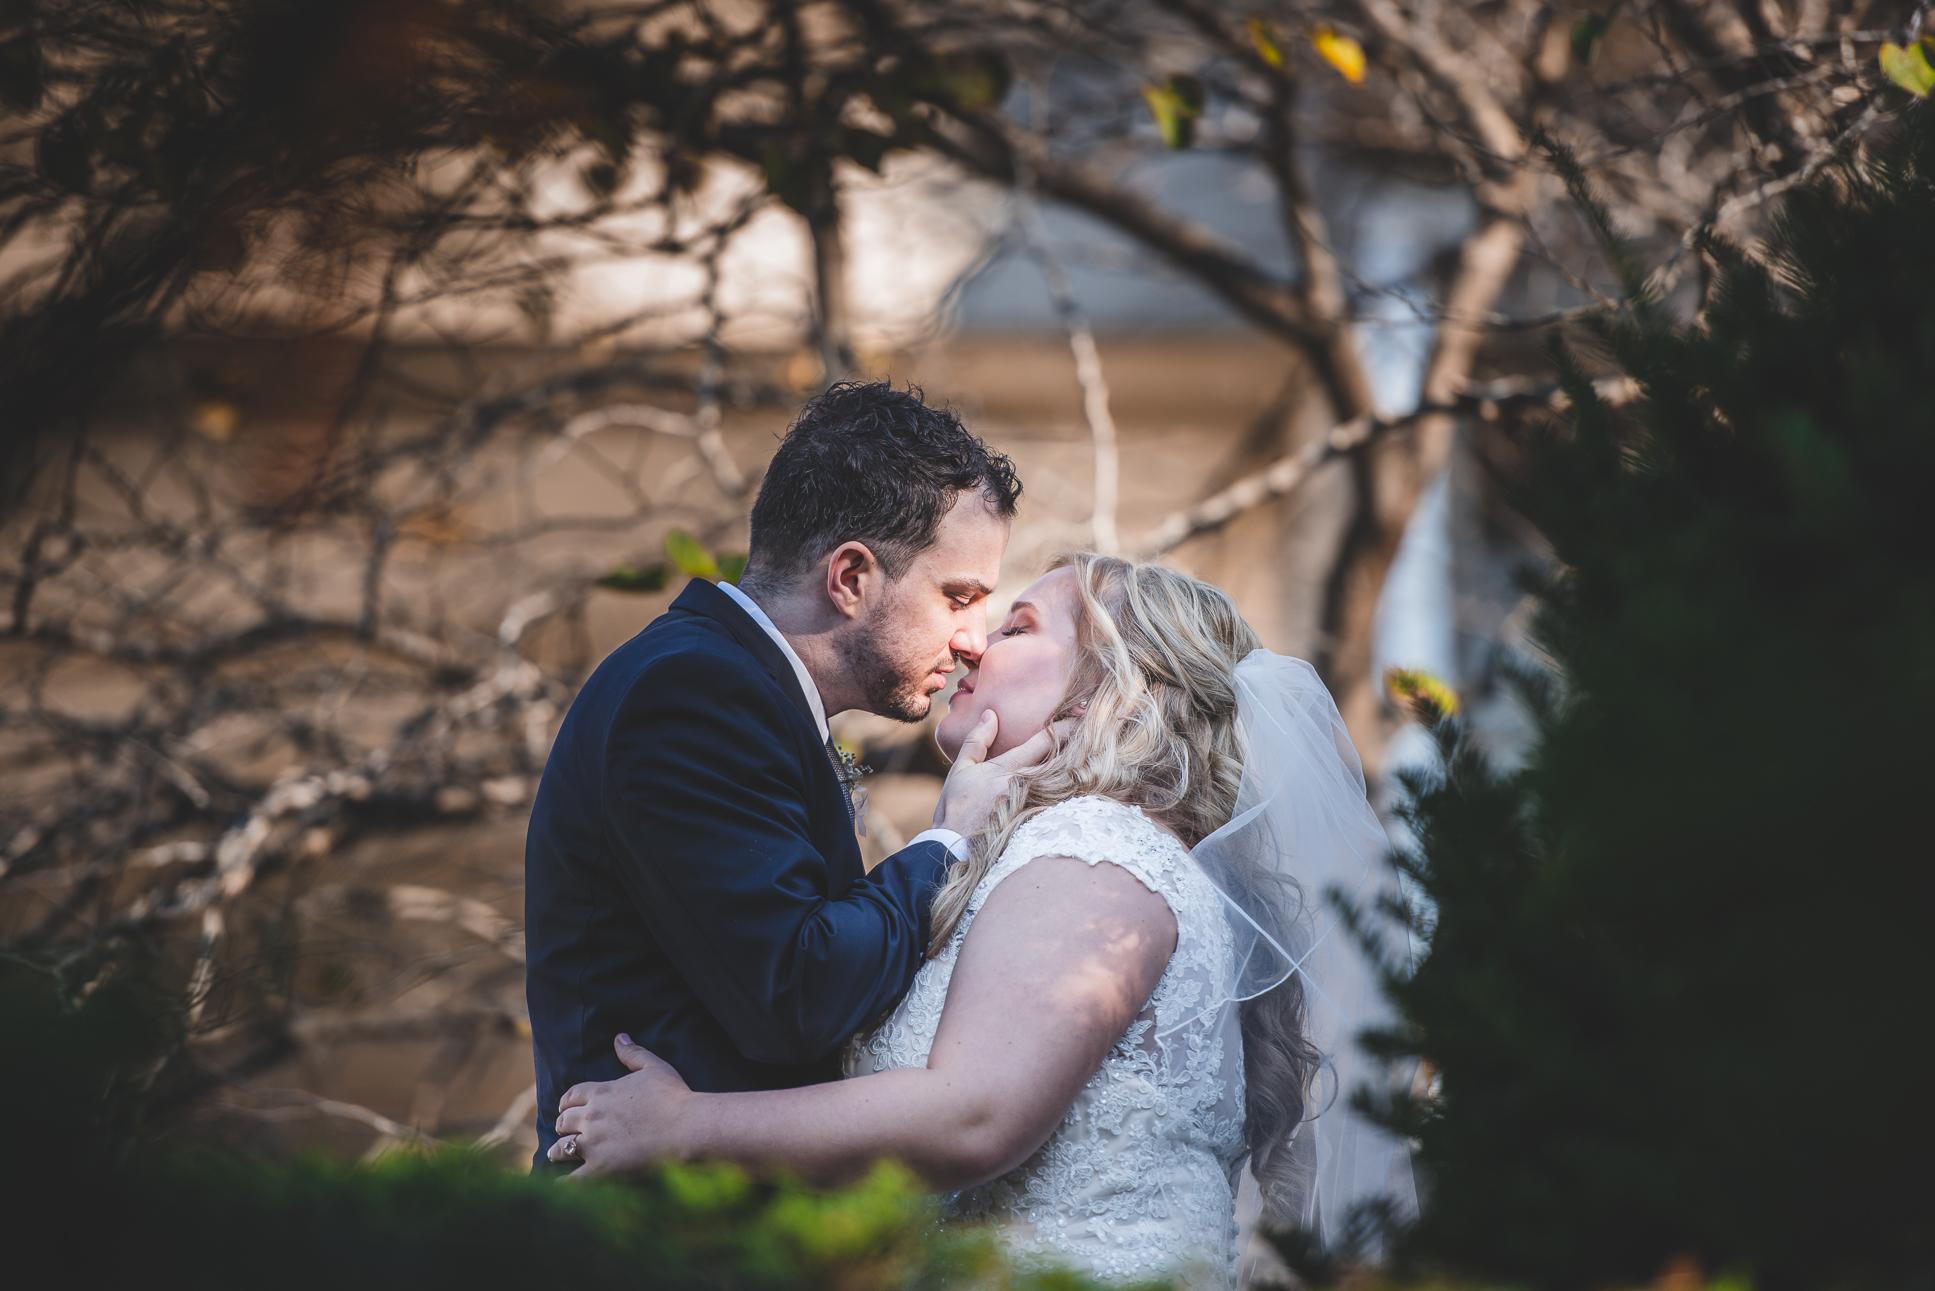 Martin Wedding - Dustin Morrison Photography-32.jpg